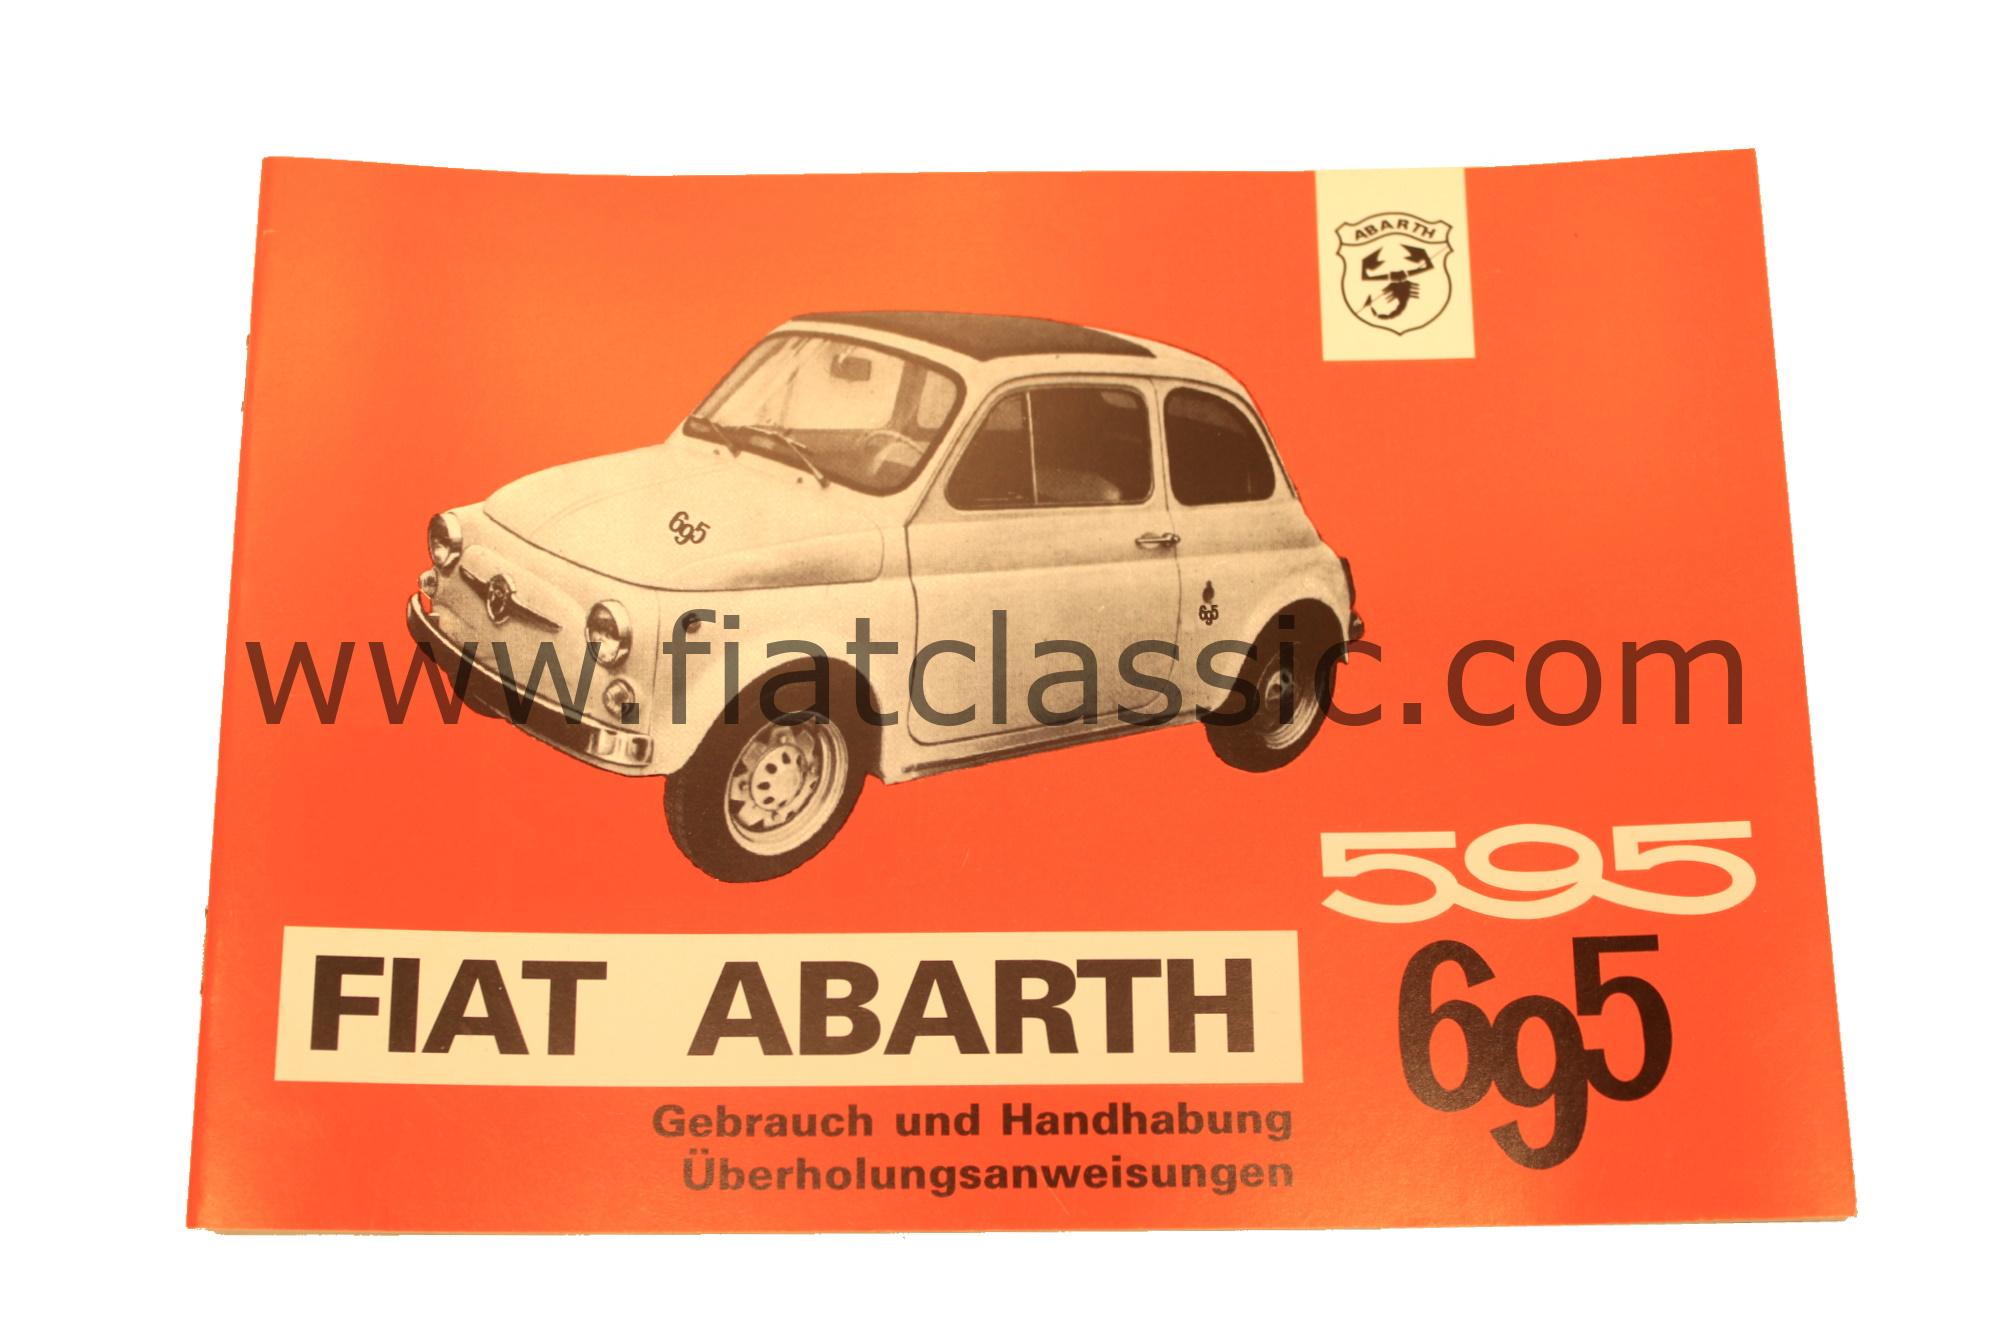 Auto & Motorrad: Teile Sonstige sainchargny.com Classic Fiat 500 ...